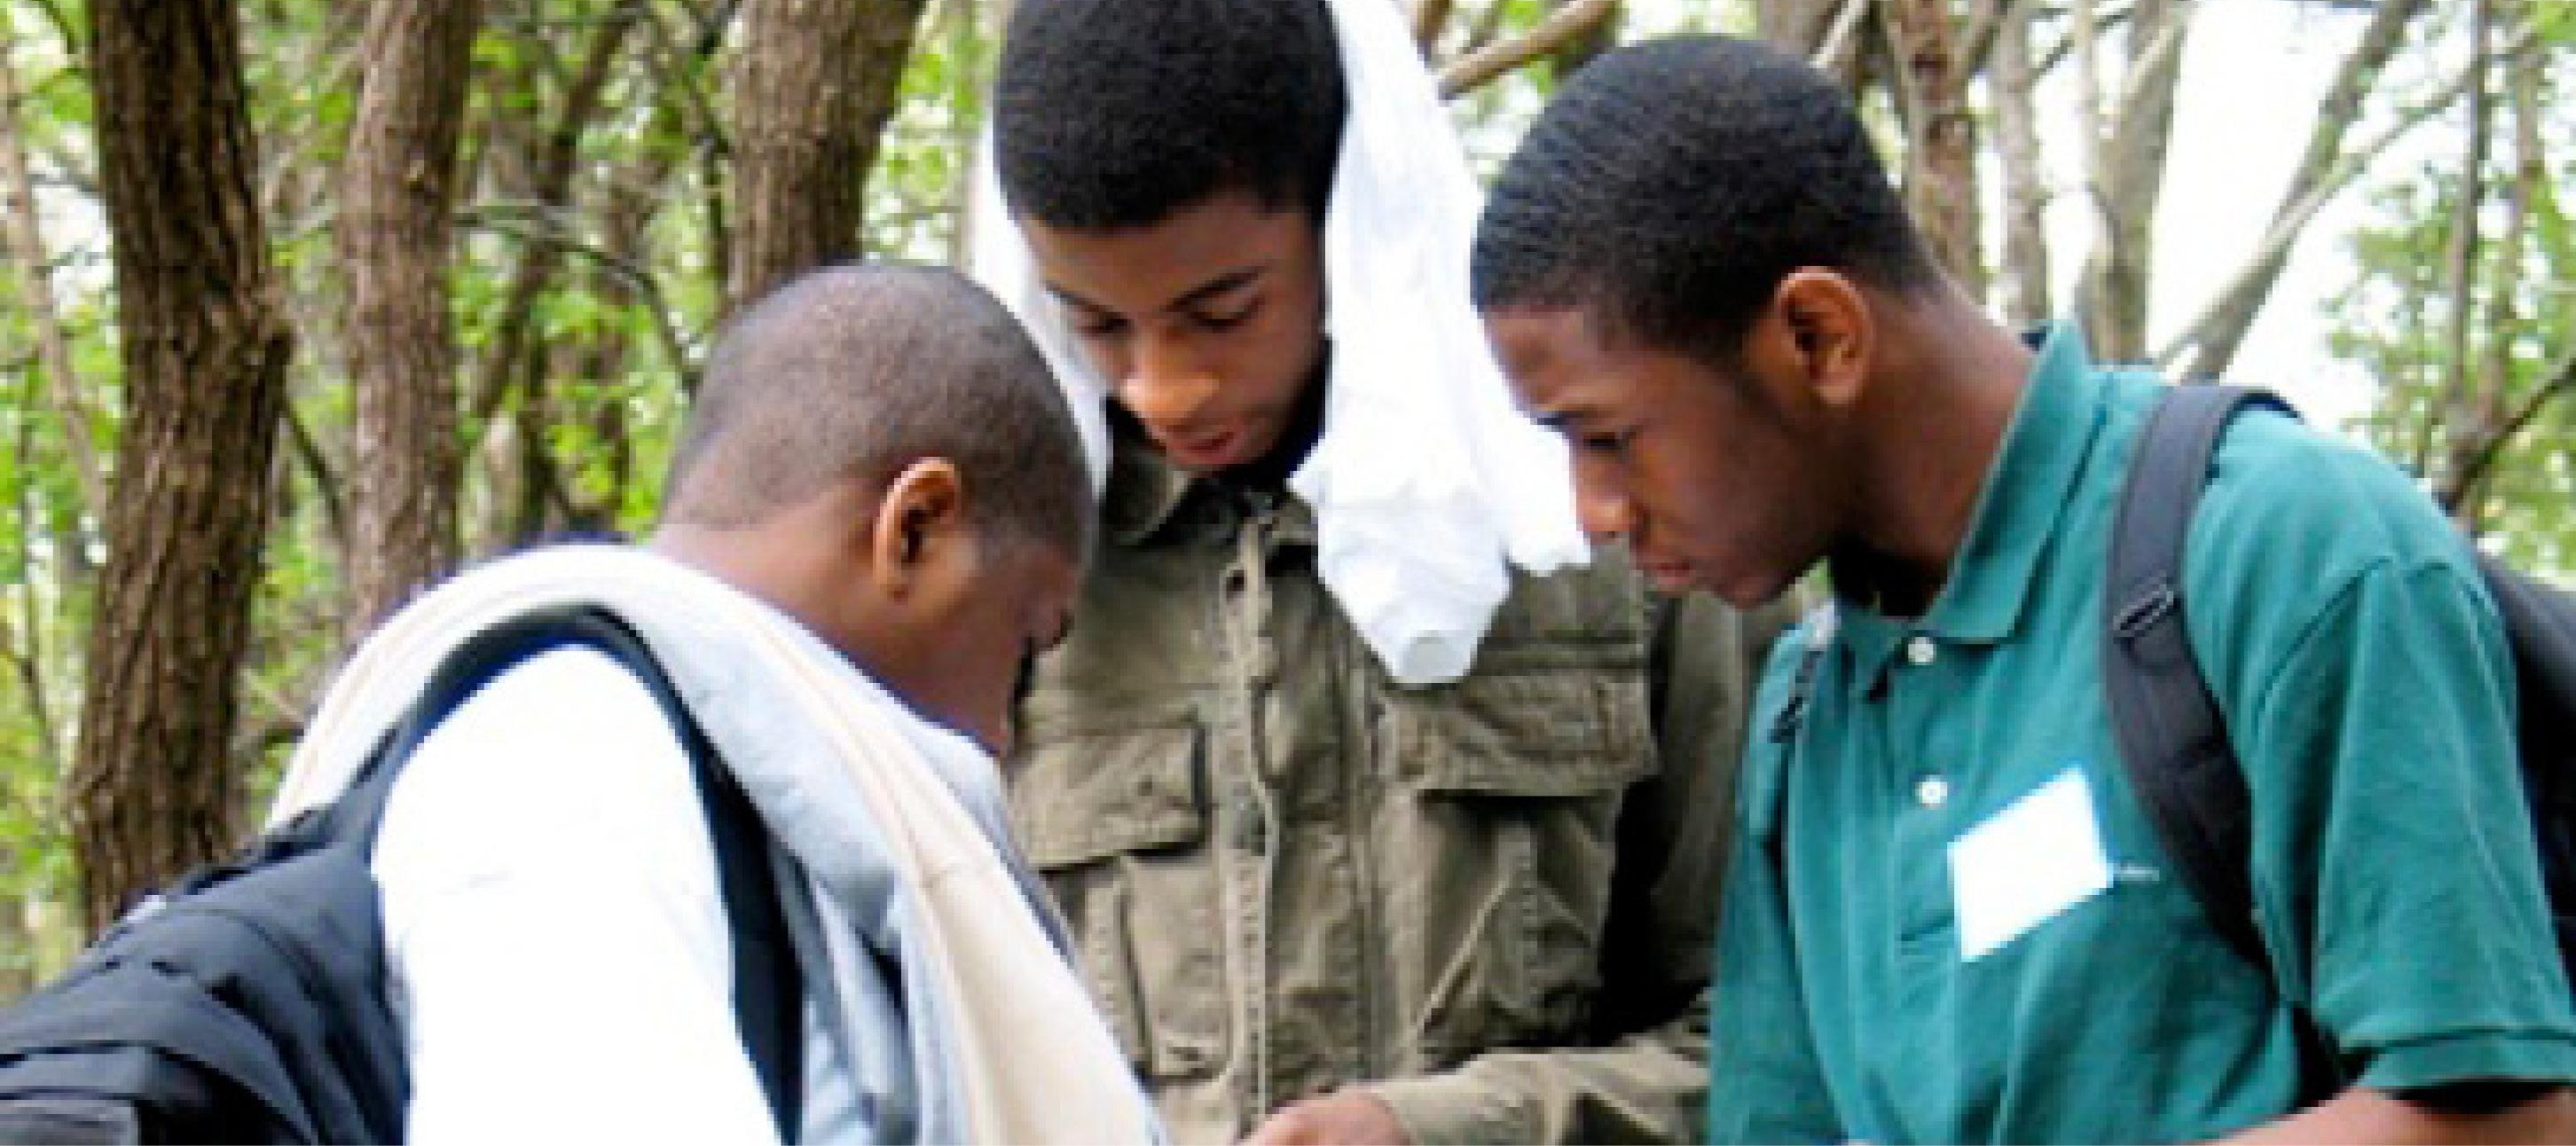 Boy Scouts Environmental Science Merit Badge